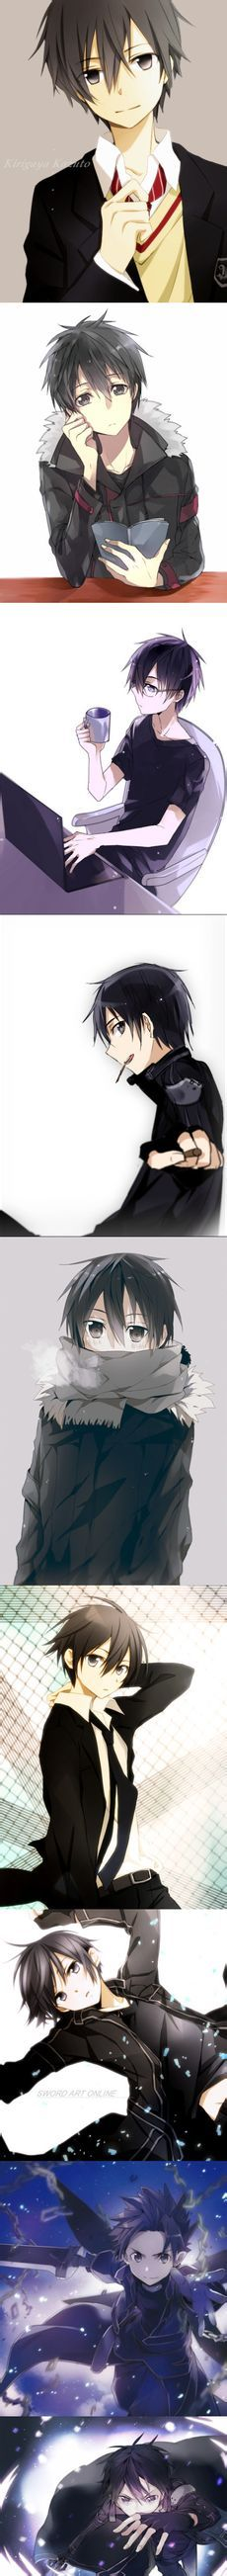 Kirito from SAO #Anime